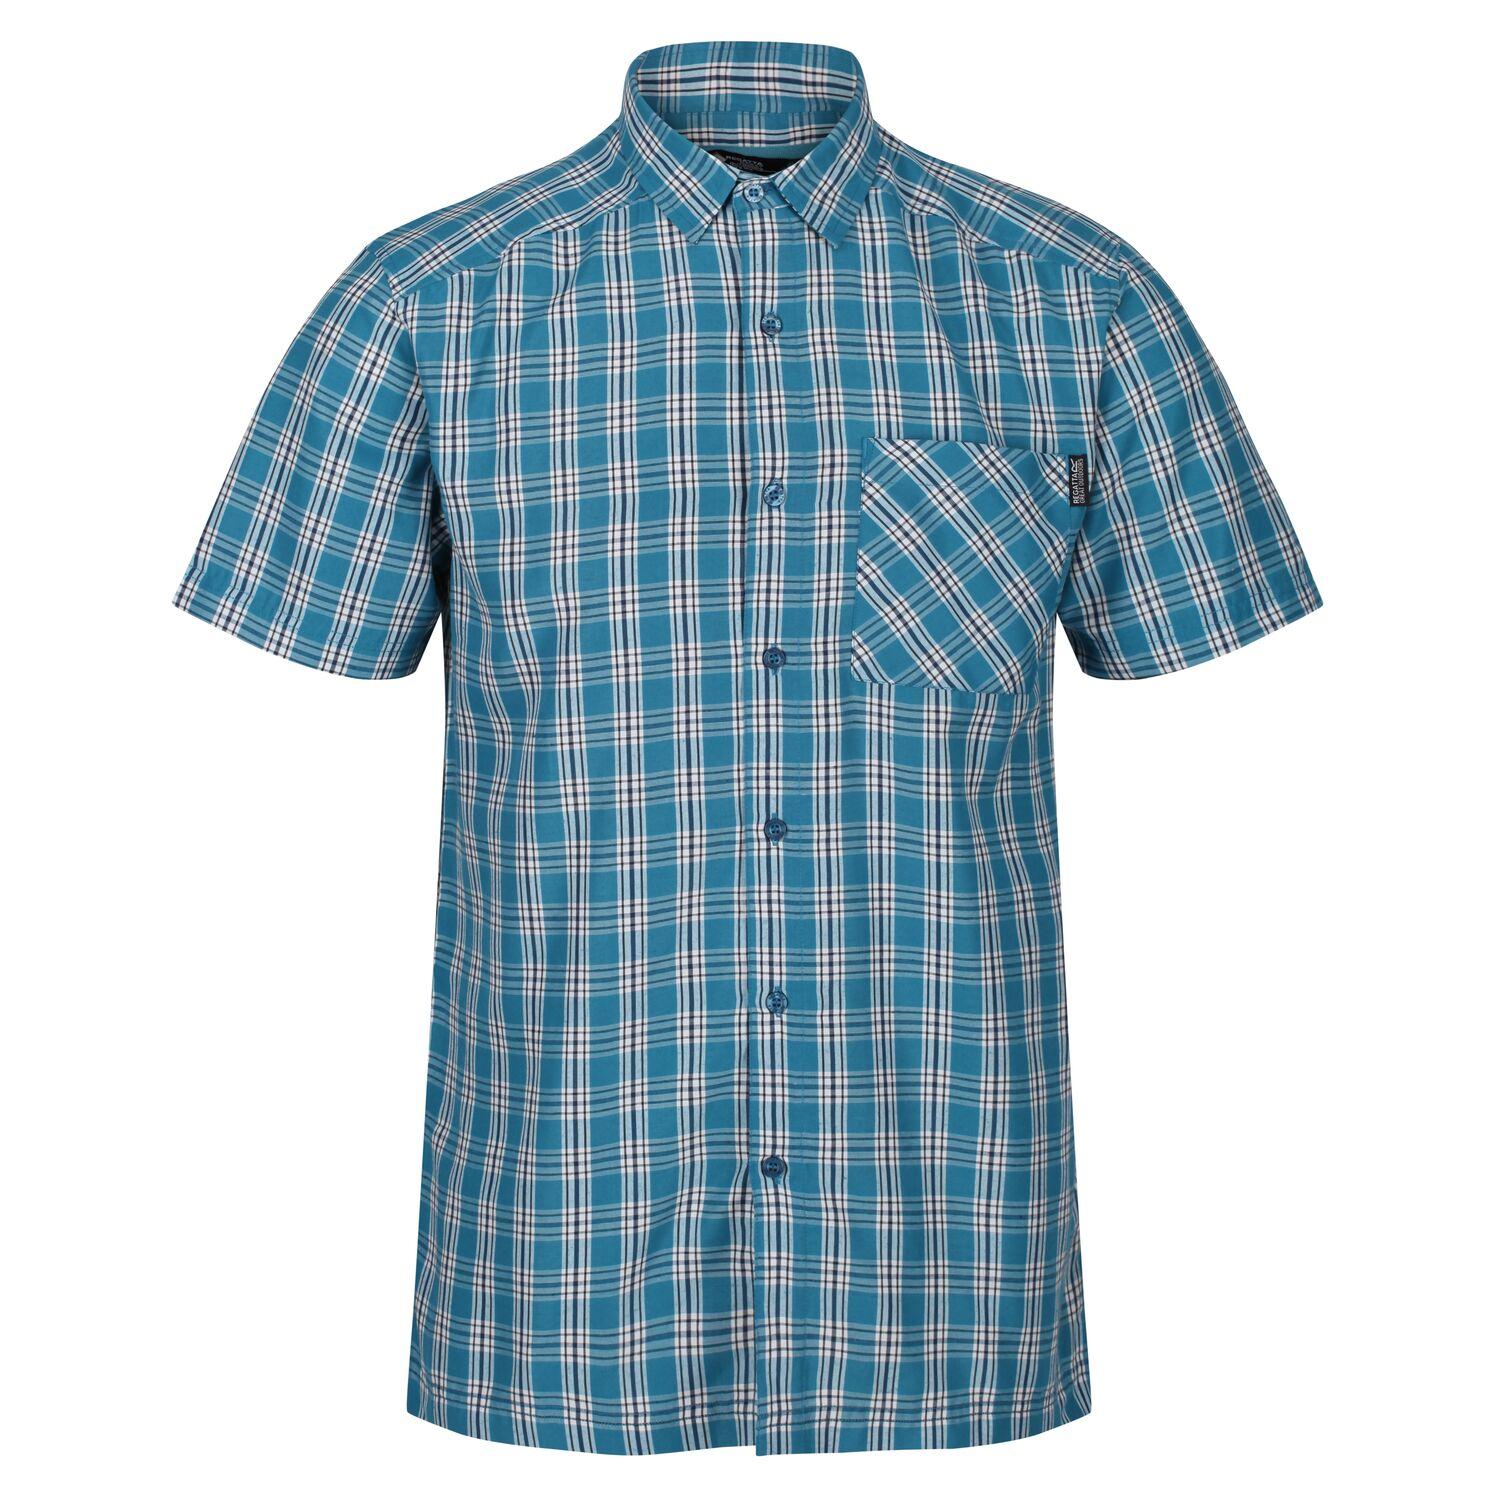 Regatta Mens Mindano V Short Sleeved Checked Shirt (S) (Olympic Teal)